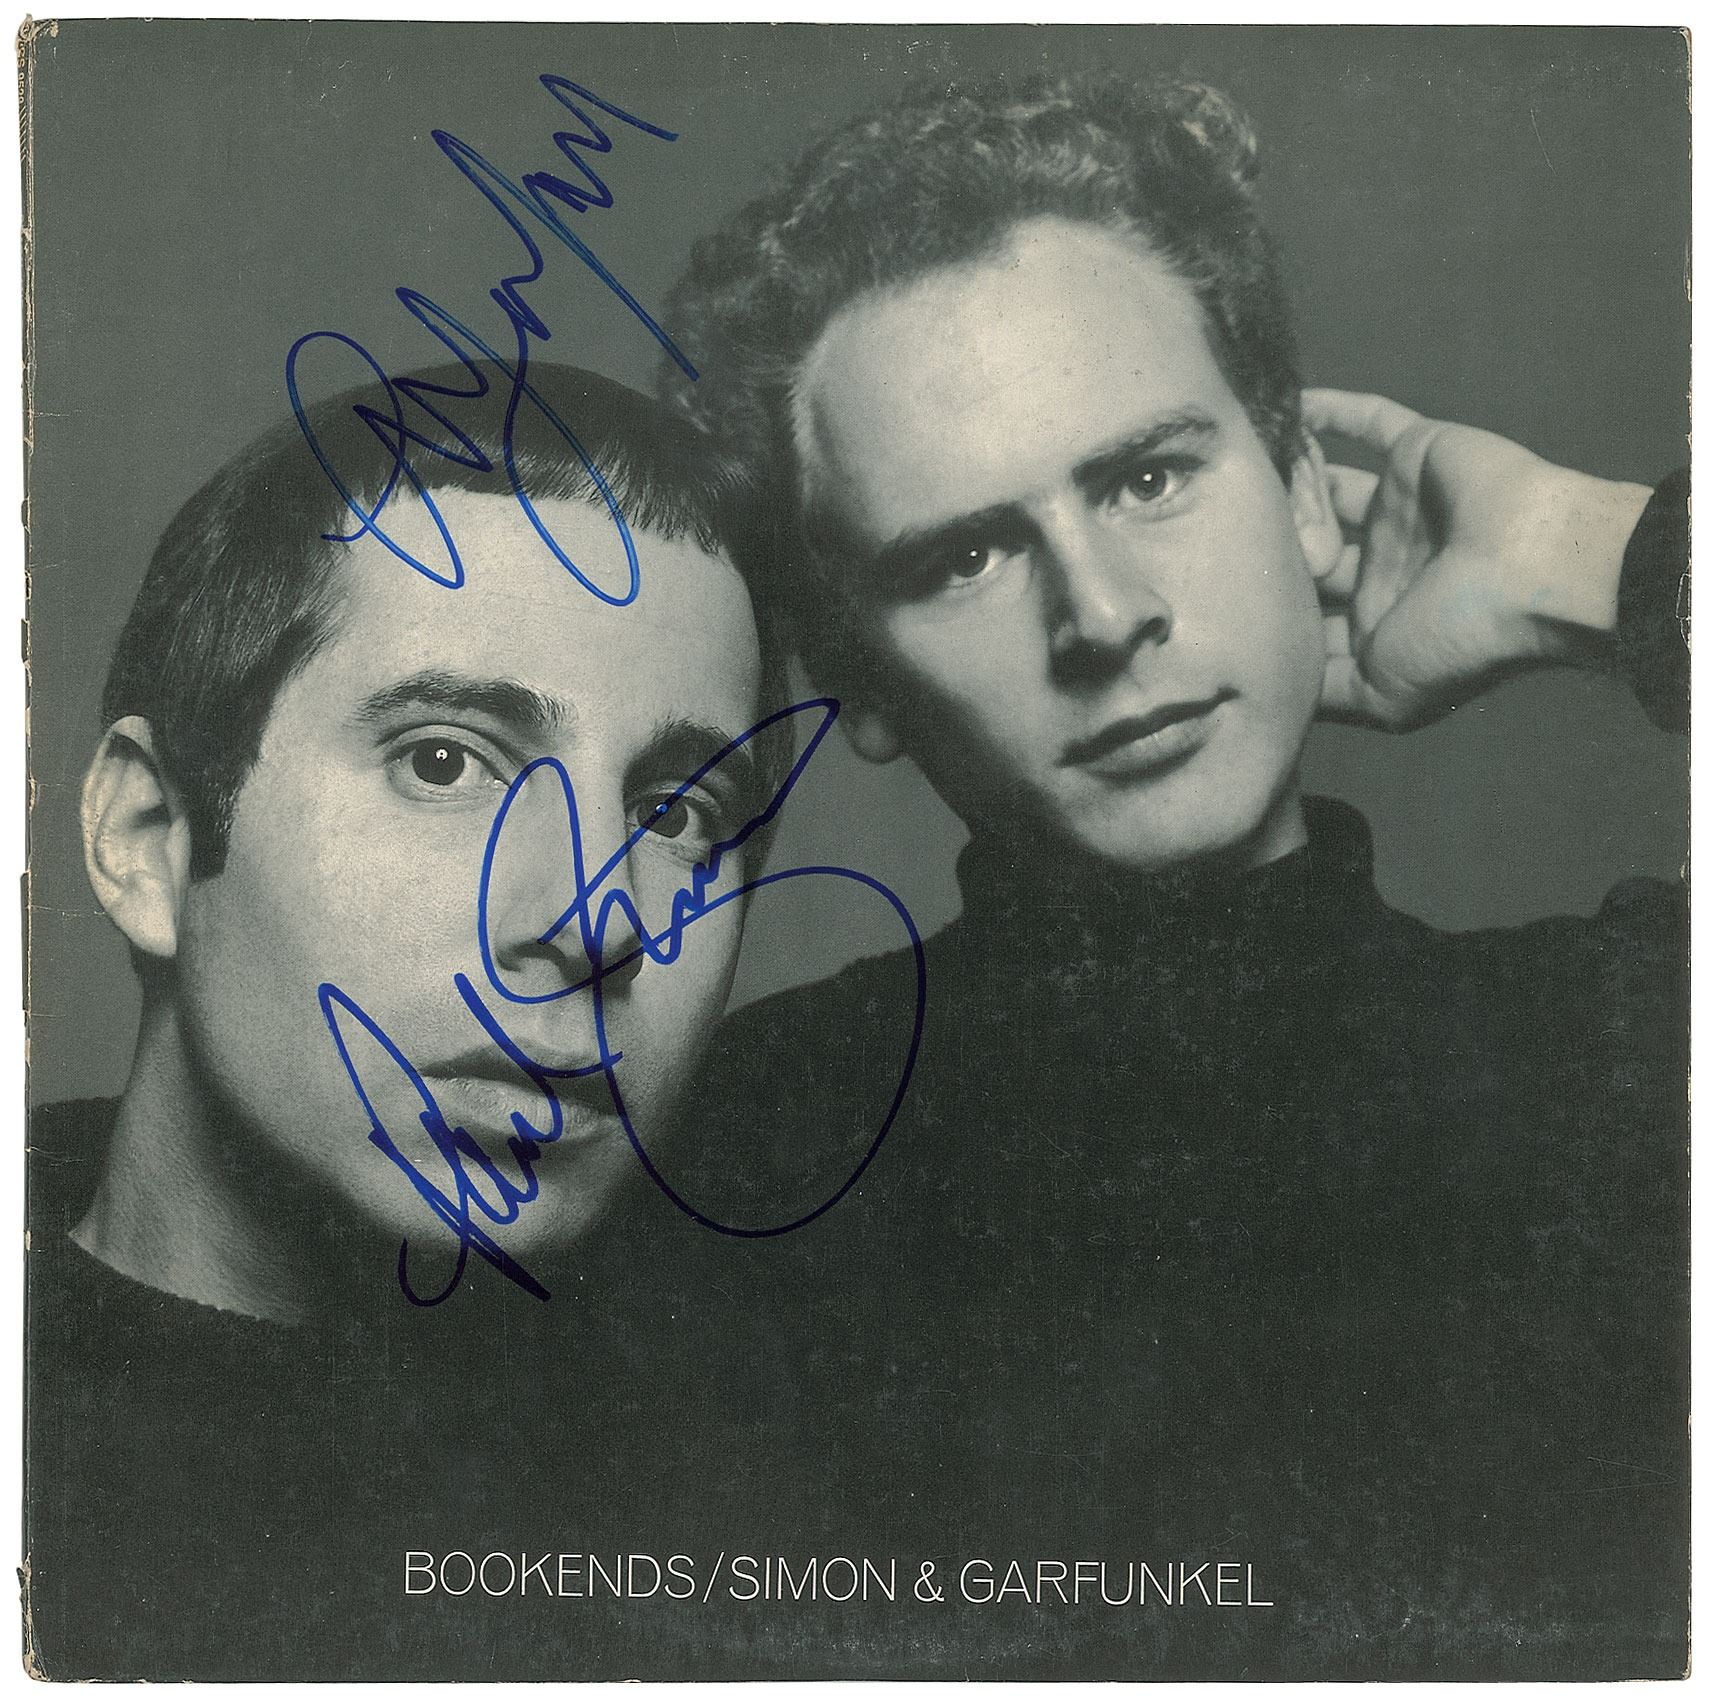 SIMON and GARFUNKEL signed autograph PHOTO DISPLAY Paul Simon Art Garfunkel